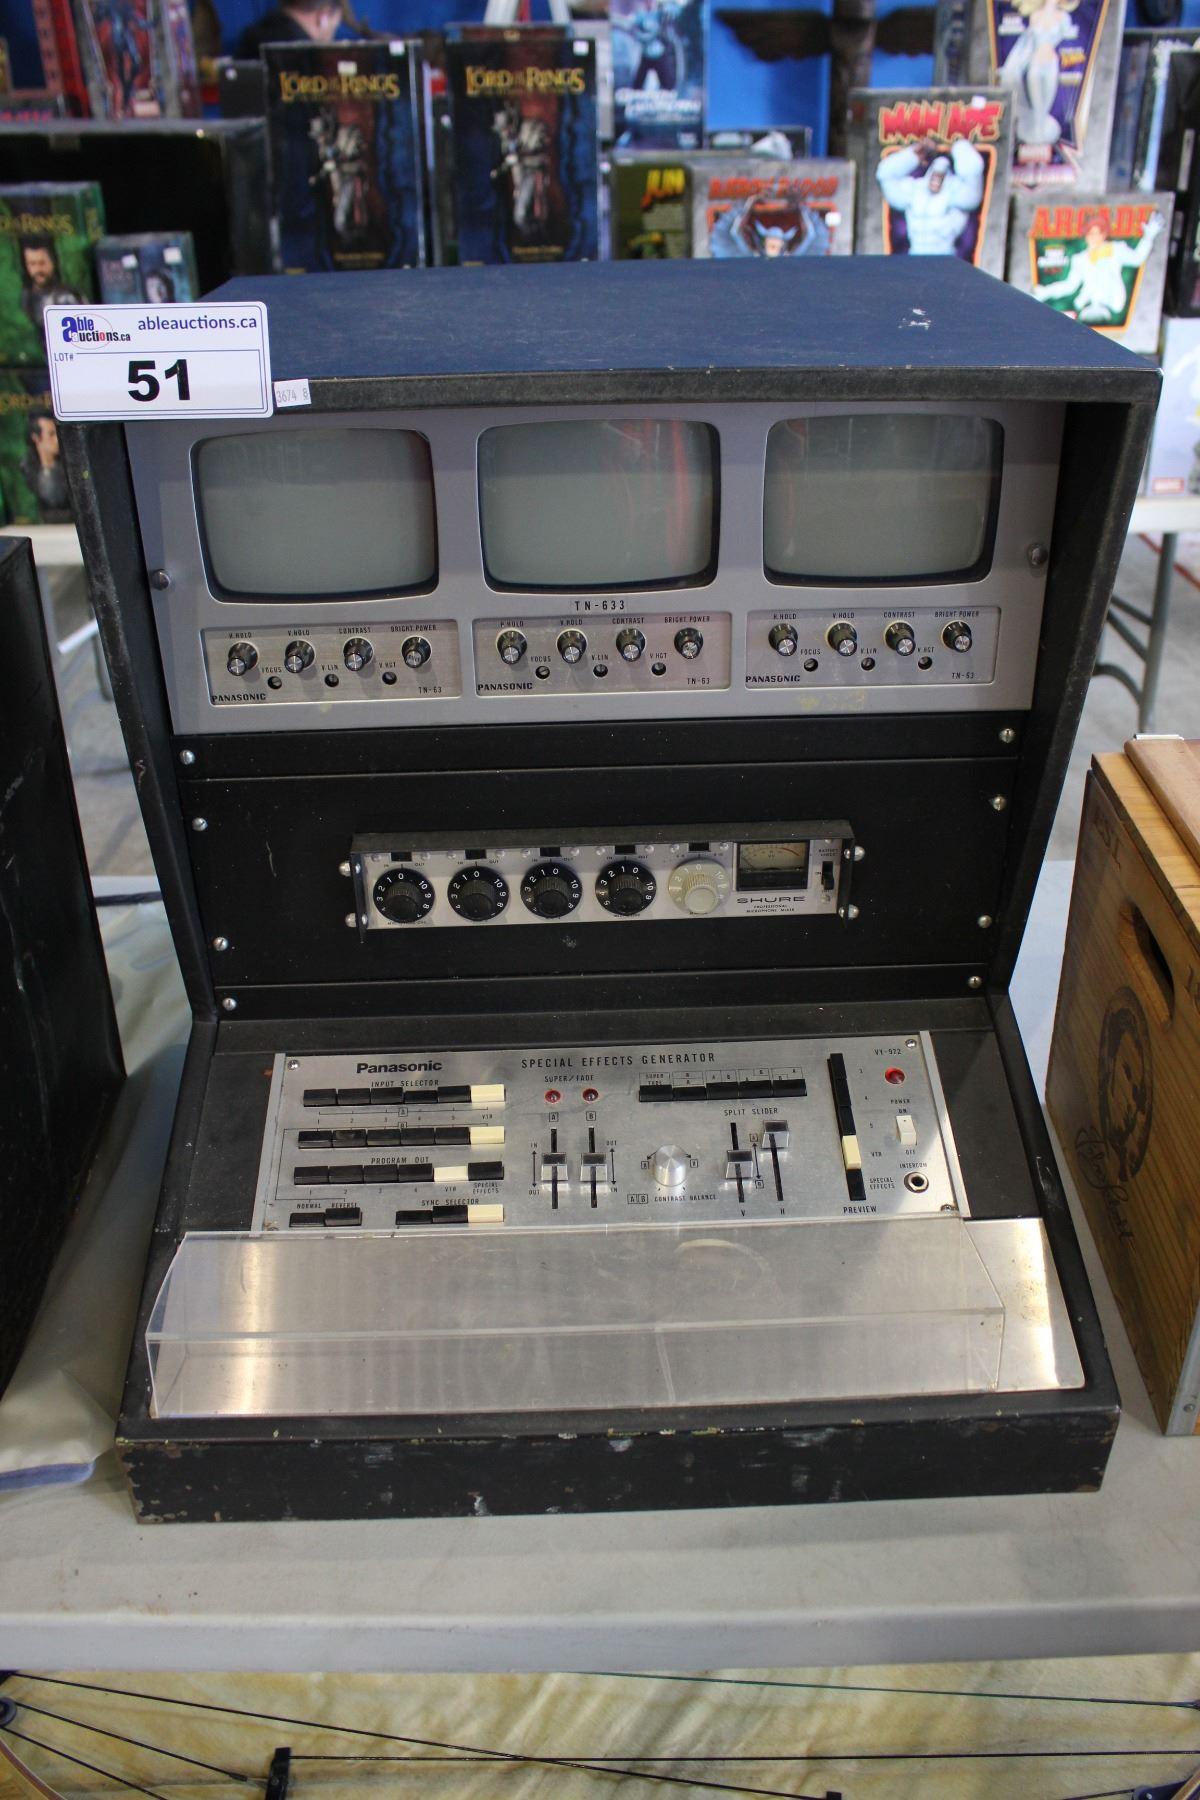 PANASONIC SPECIAL EFFECTS GENERATOR TN-633